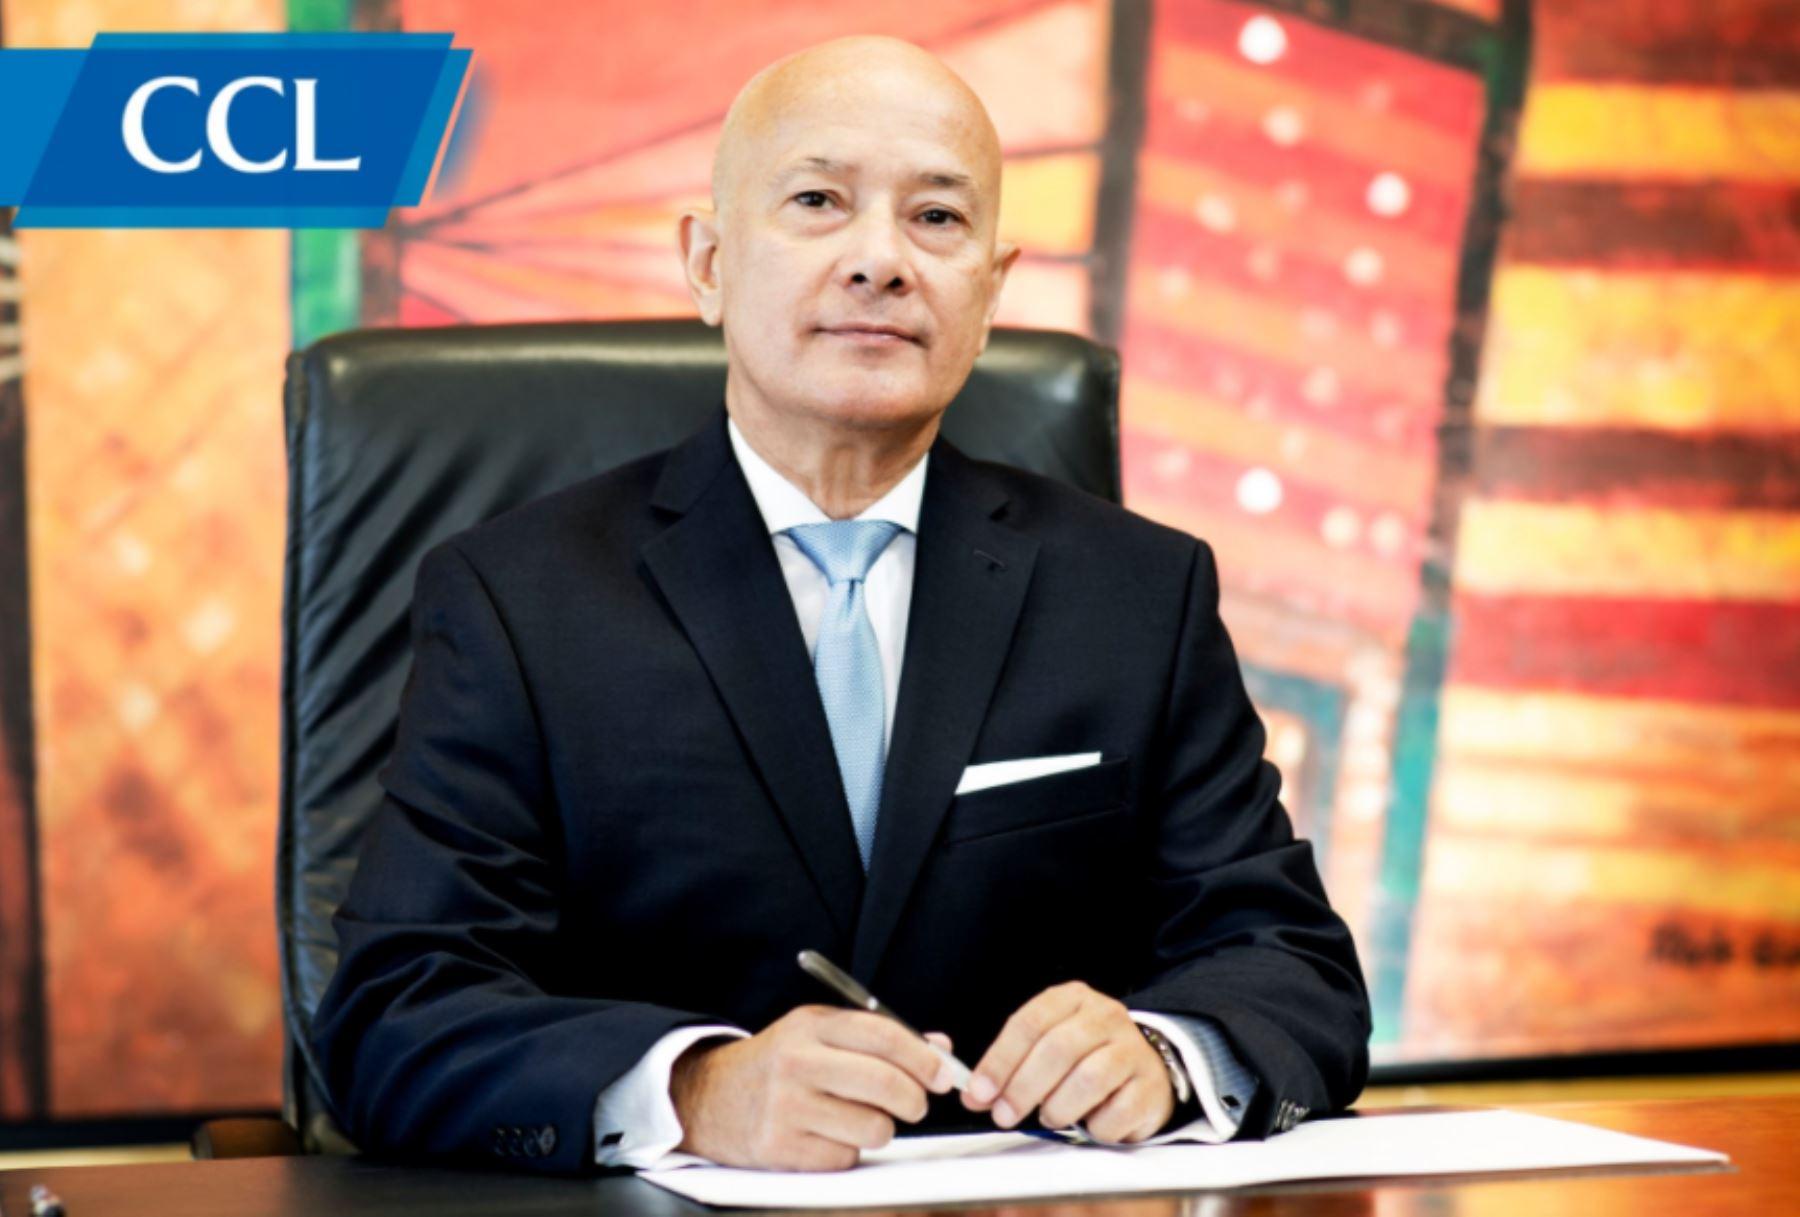 Presidente de la Cámara de Comercio de Lima, Mario Mongilardi. Foto: Difusión.